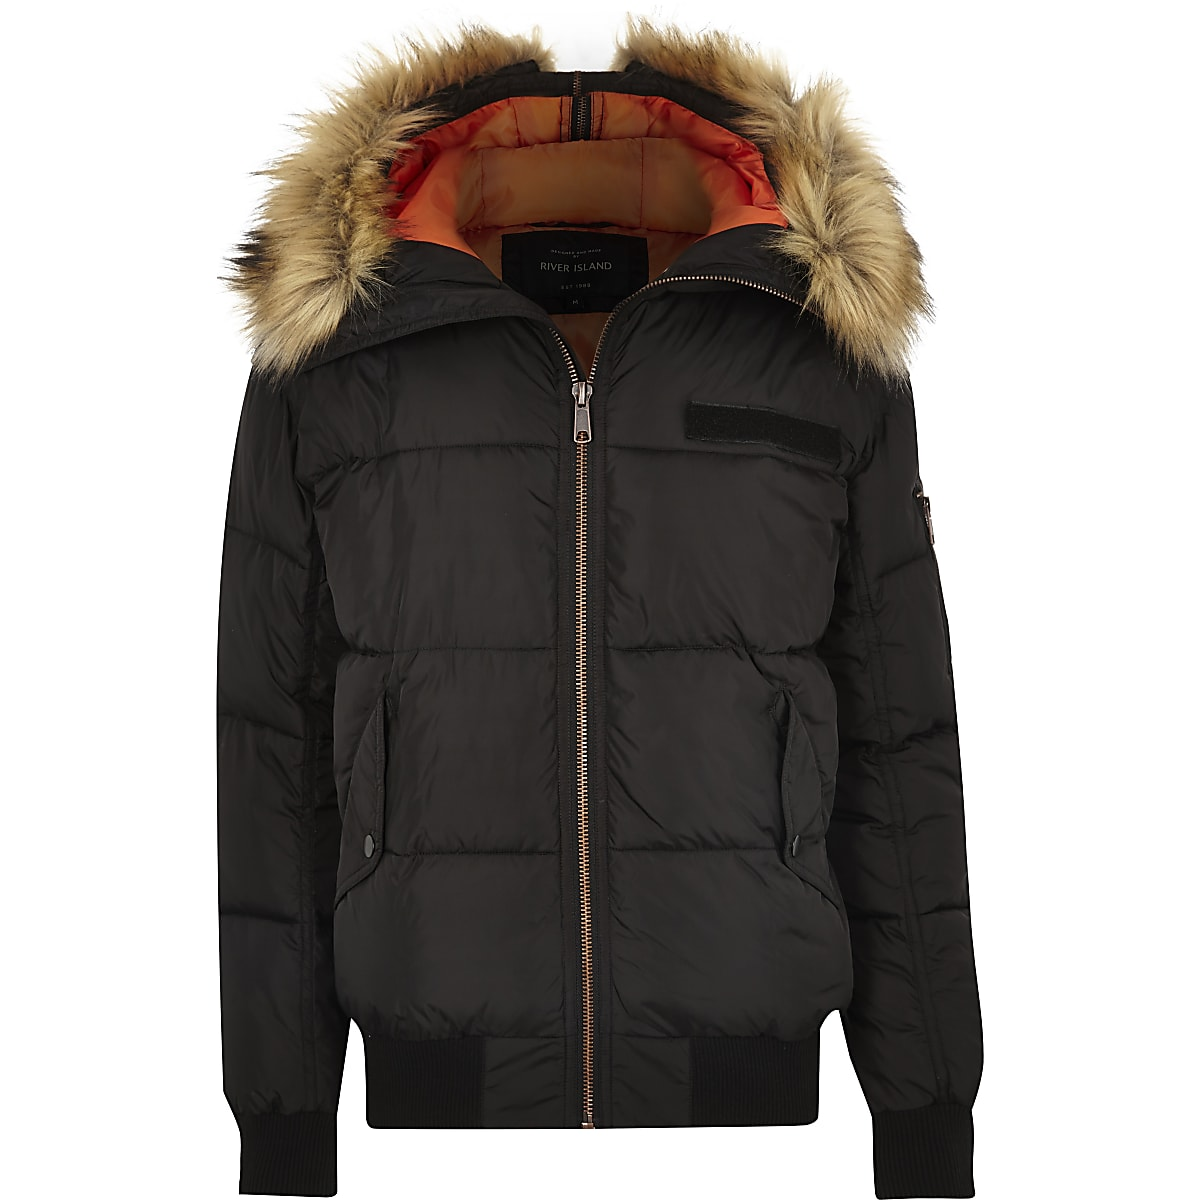 c34e7fece Black faux fur trim hooded puffer jacket